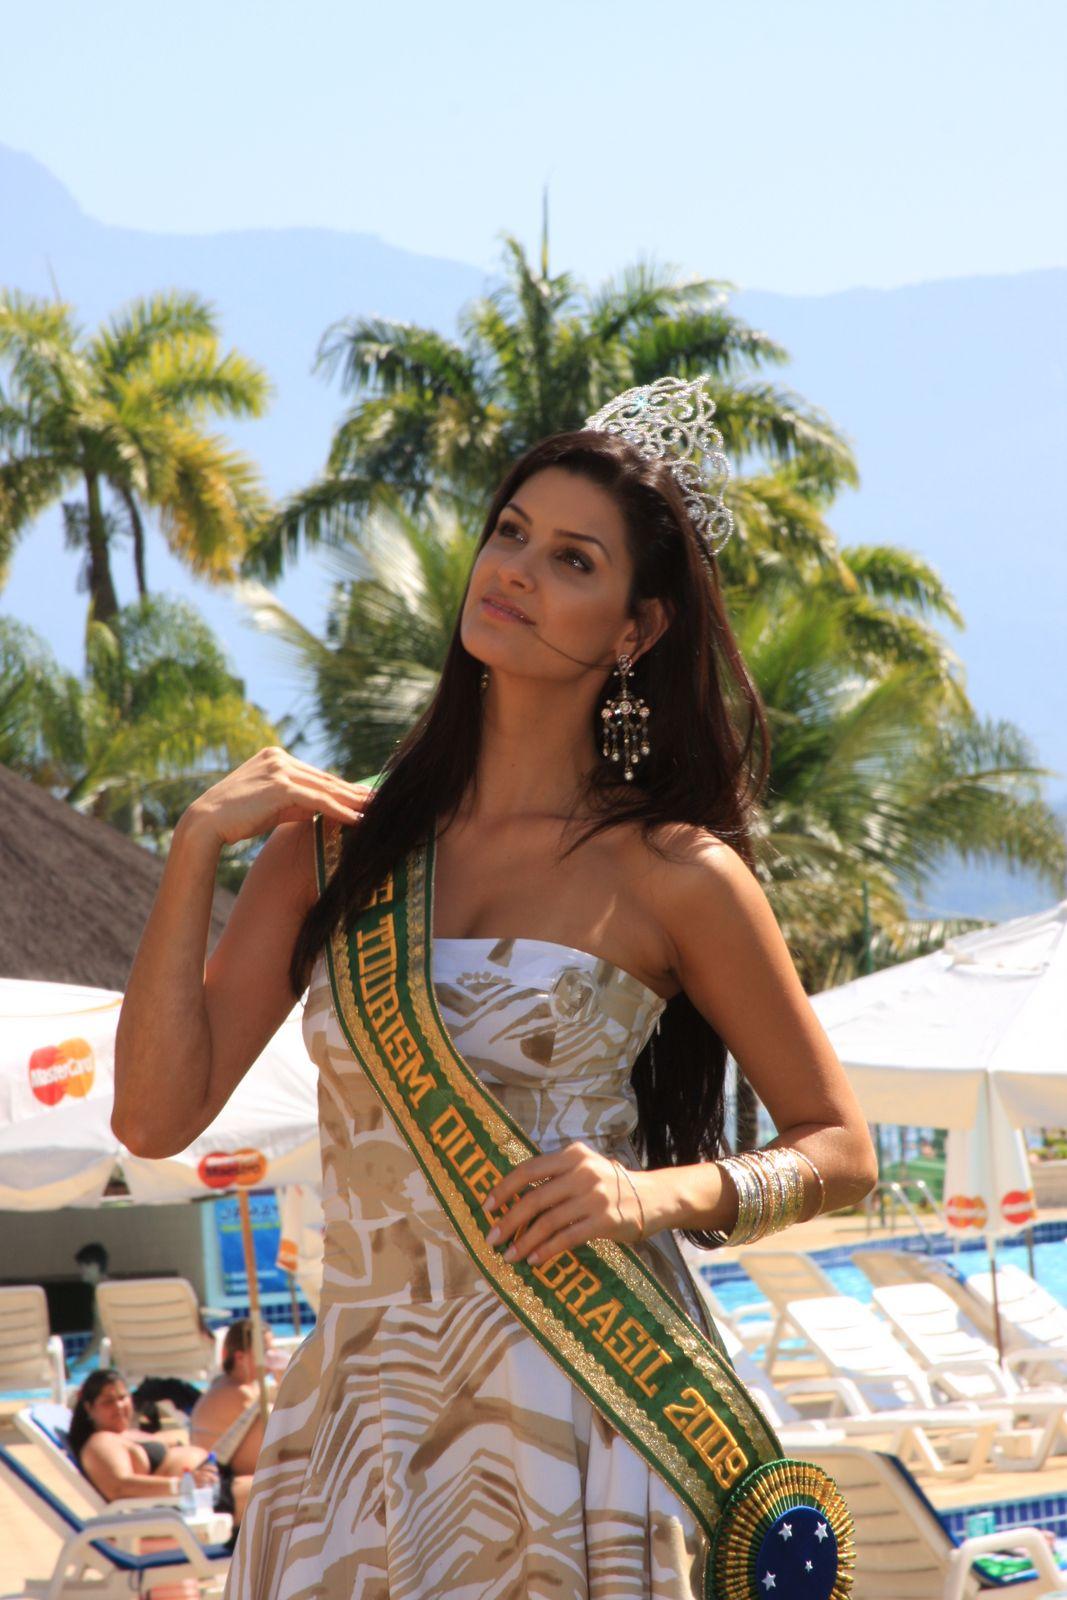 vivian noronha, rainha hispanoamericana 2008. suplente. - Página 2 8bhykpgp